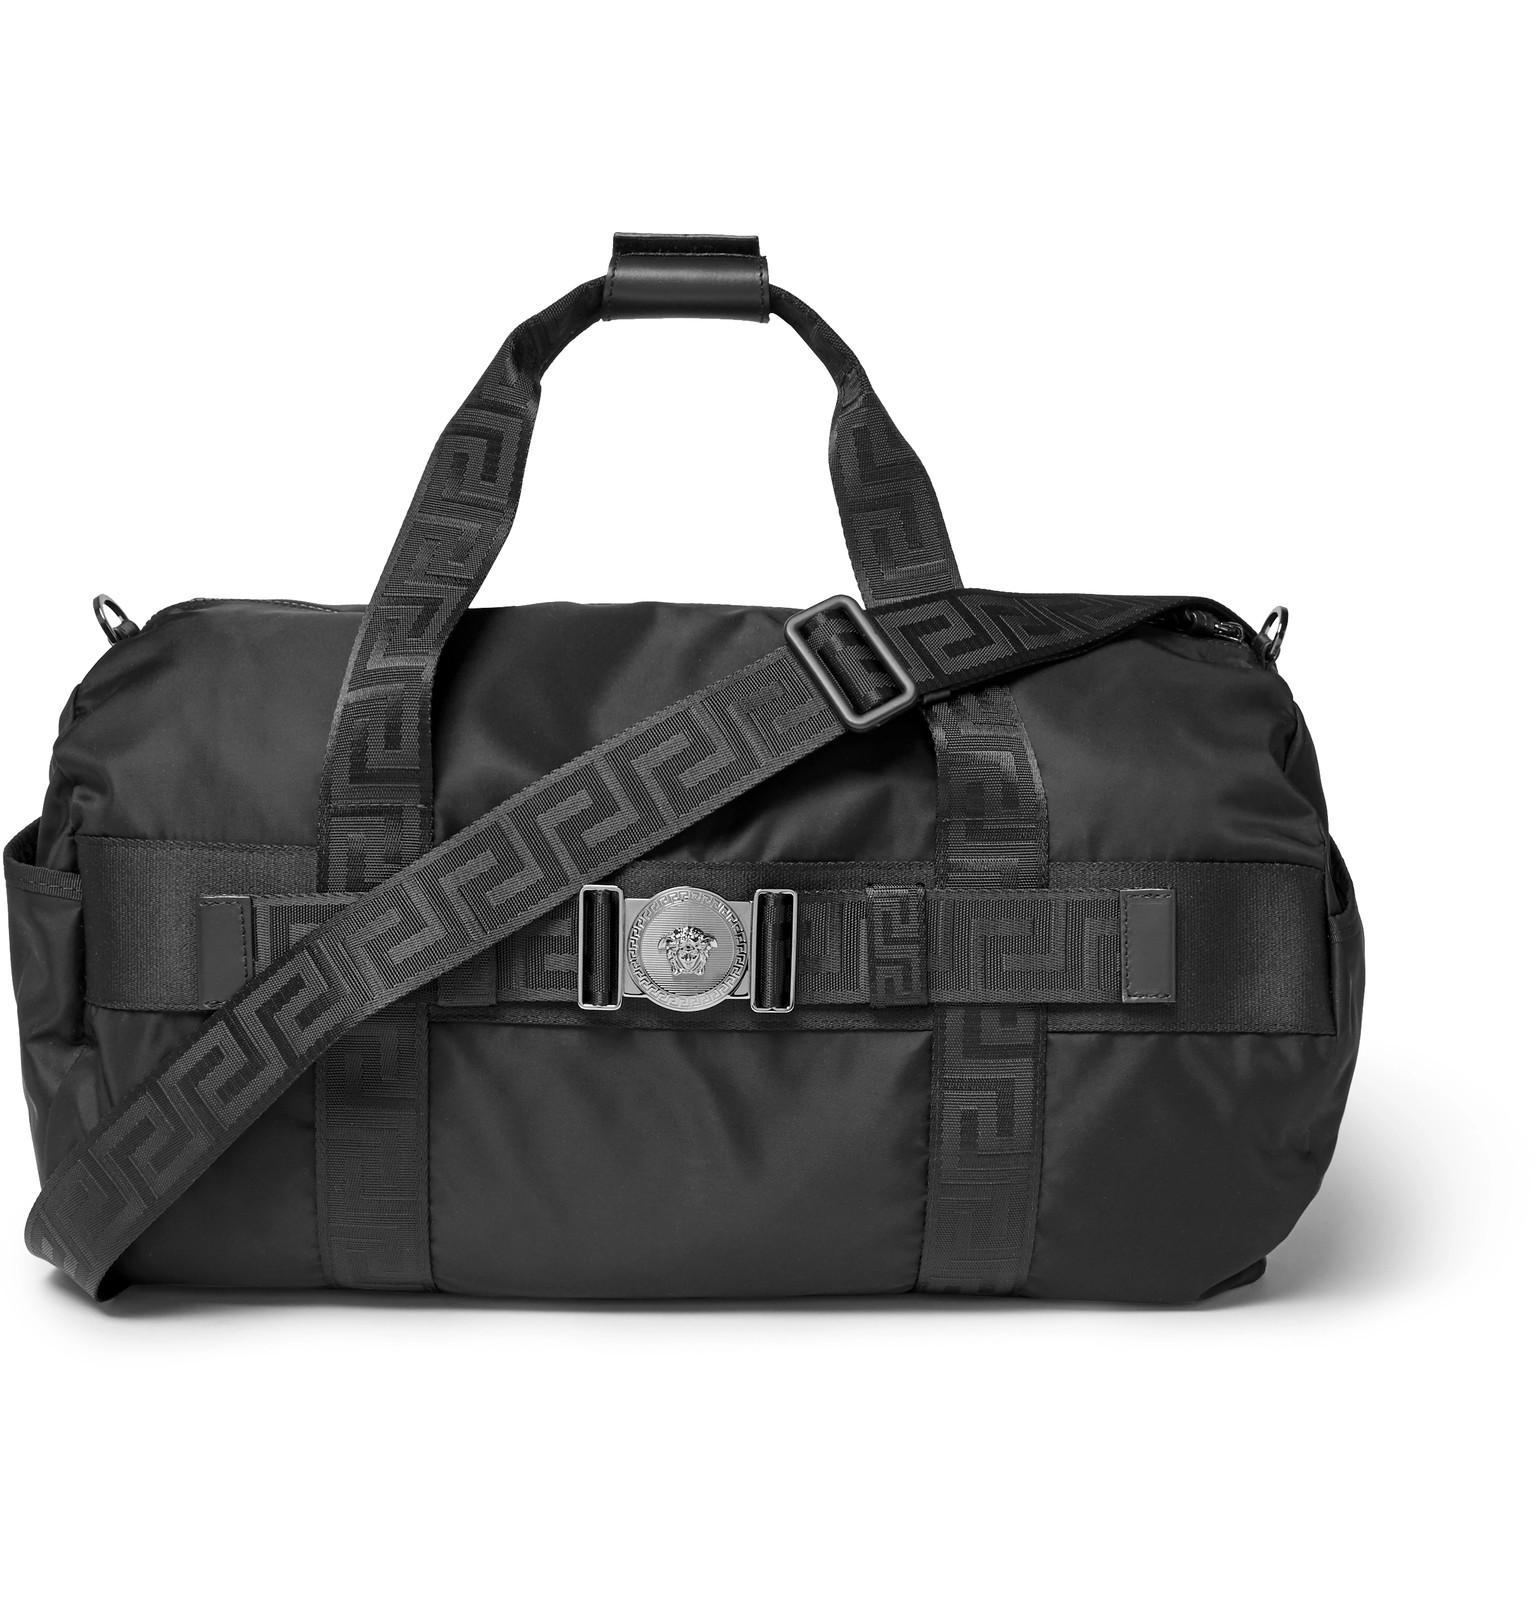 71a185b017a3 Versace Logo-embellished Nylon Duffle Bag in Black for Men - Lyst